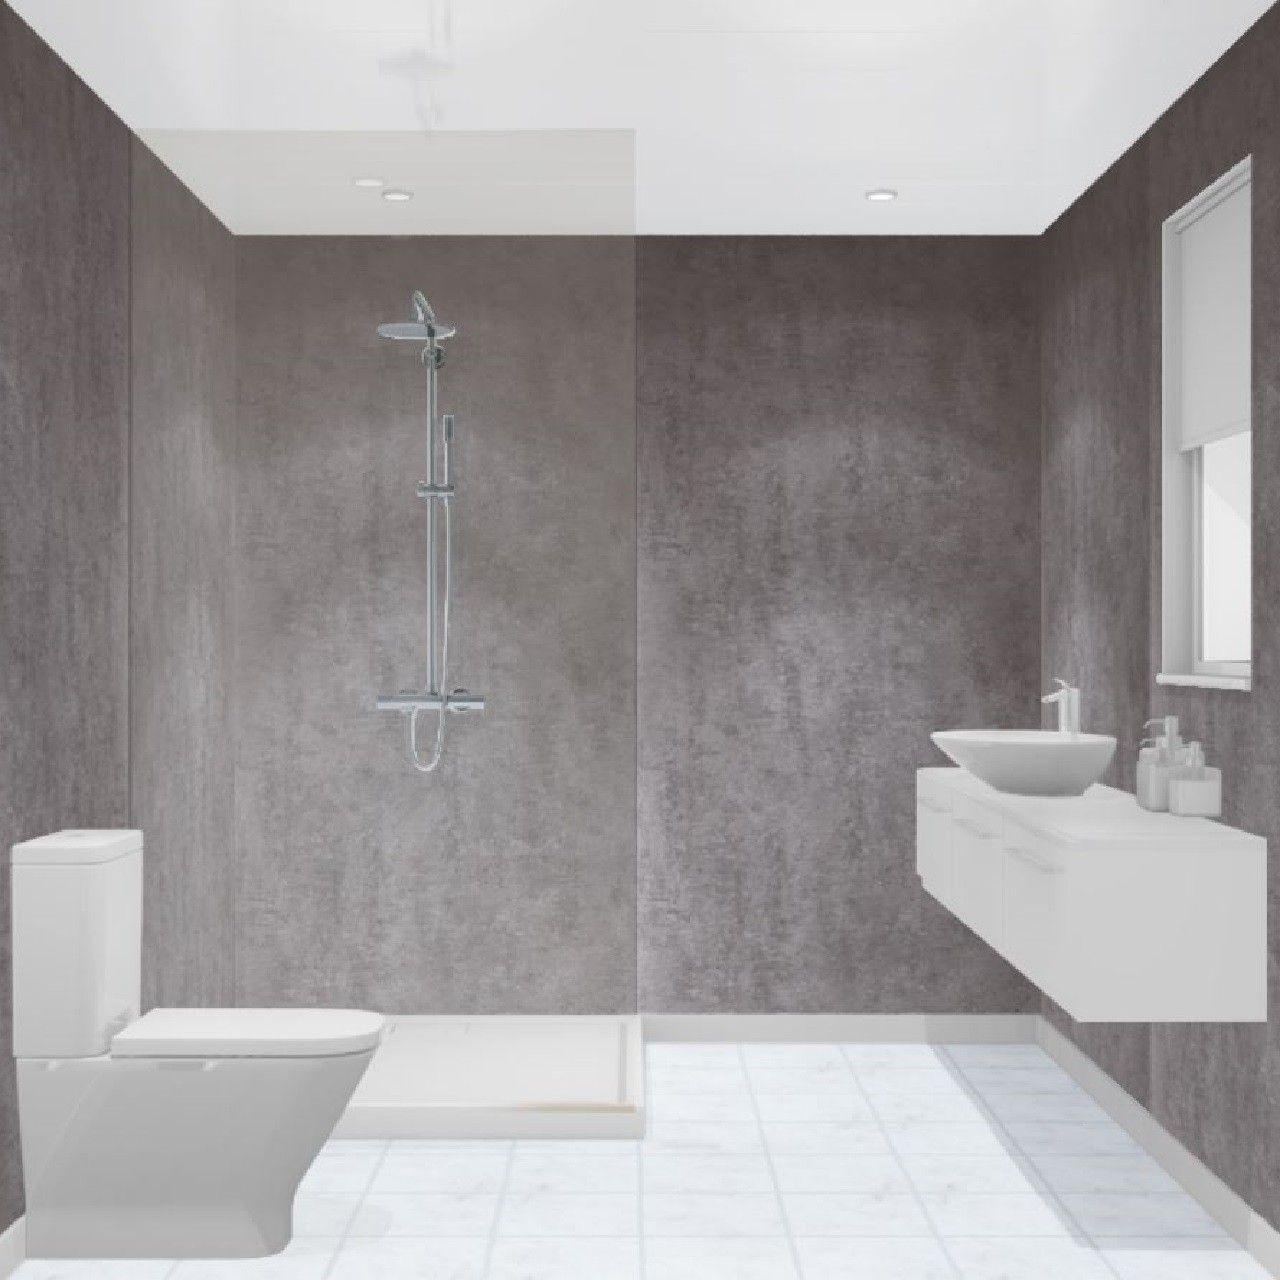 Multipanel Linda Barker Concrete Elements 2400mm X 1200mm Hydro Lock Tongue Groove Bathroom Wall Panel Concrete Bathroom Bathroom Wall Panels Bathroom Shower Walls